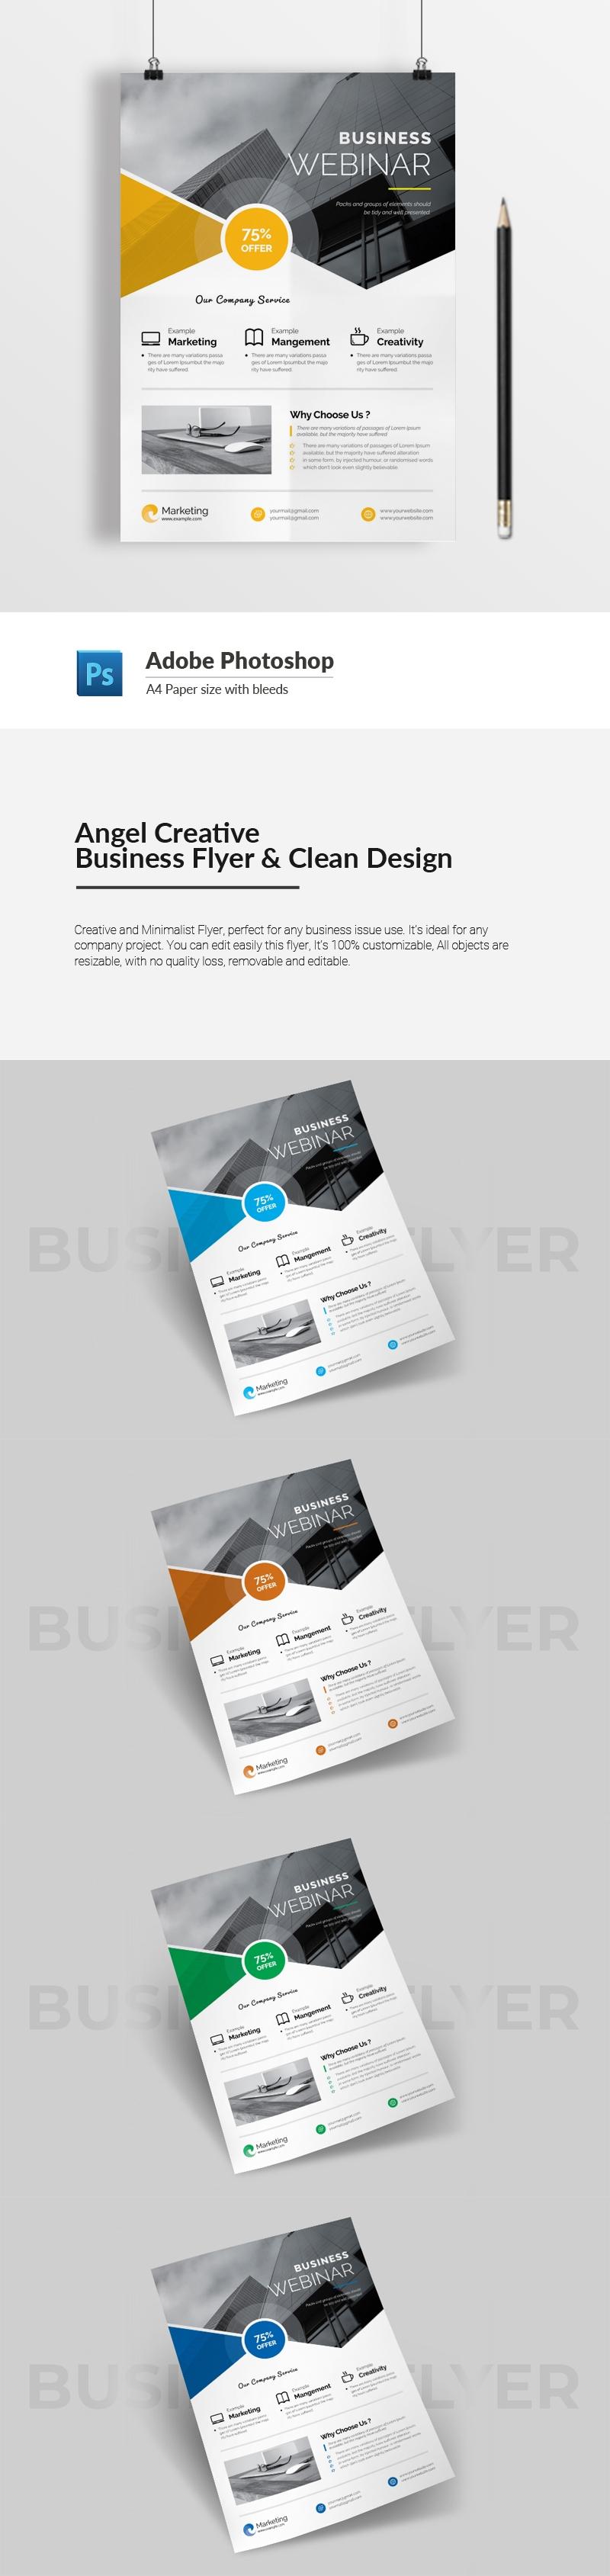 Angel Creative Business Flyer & Clean Design